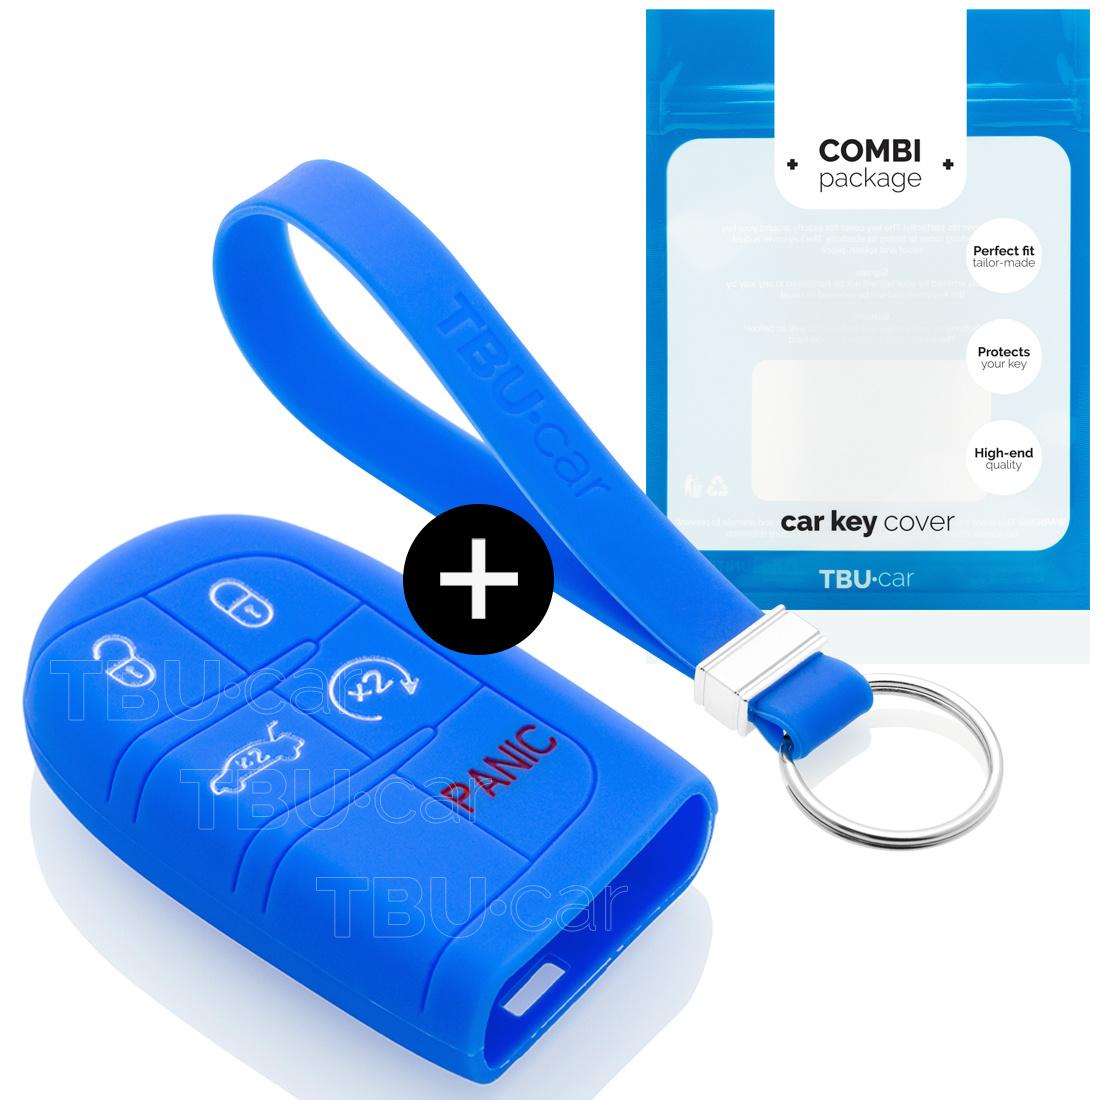 TBU car TBU car Autoschlüssel Hülle kompatibel mit Fiat 5 Tasten (Keyless Entry) - Schutzhülle aus Silikon - Auto Schlüsselhülle Cover in Blau